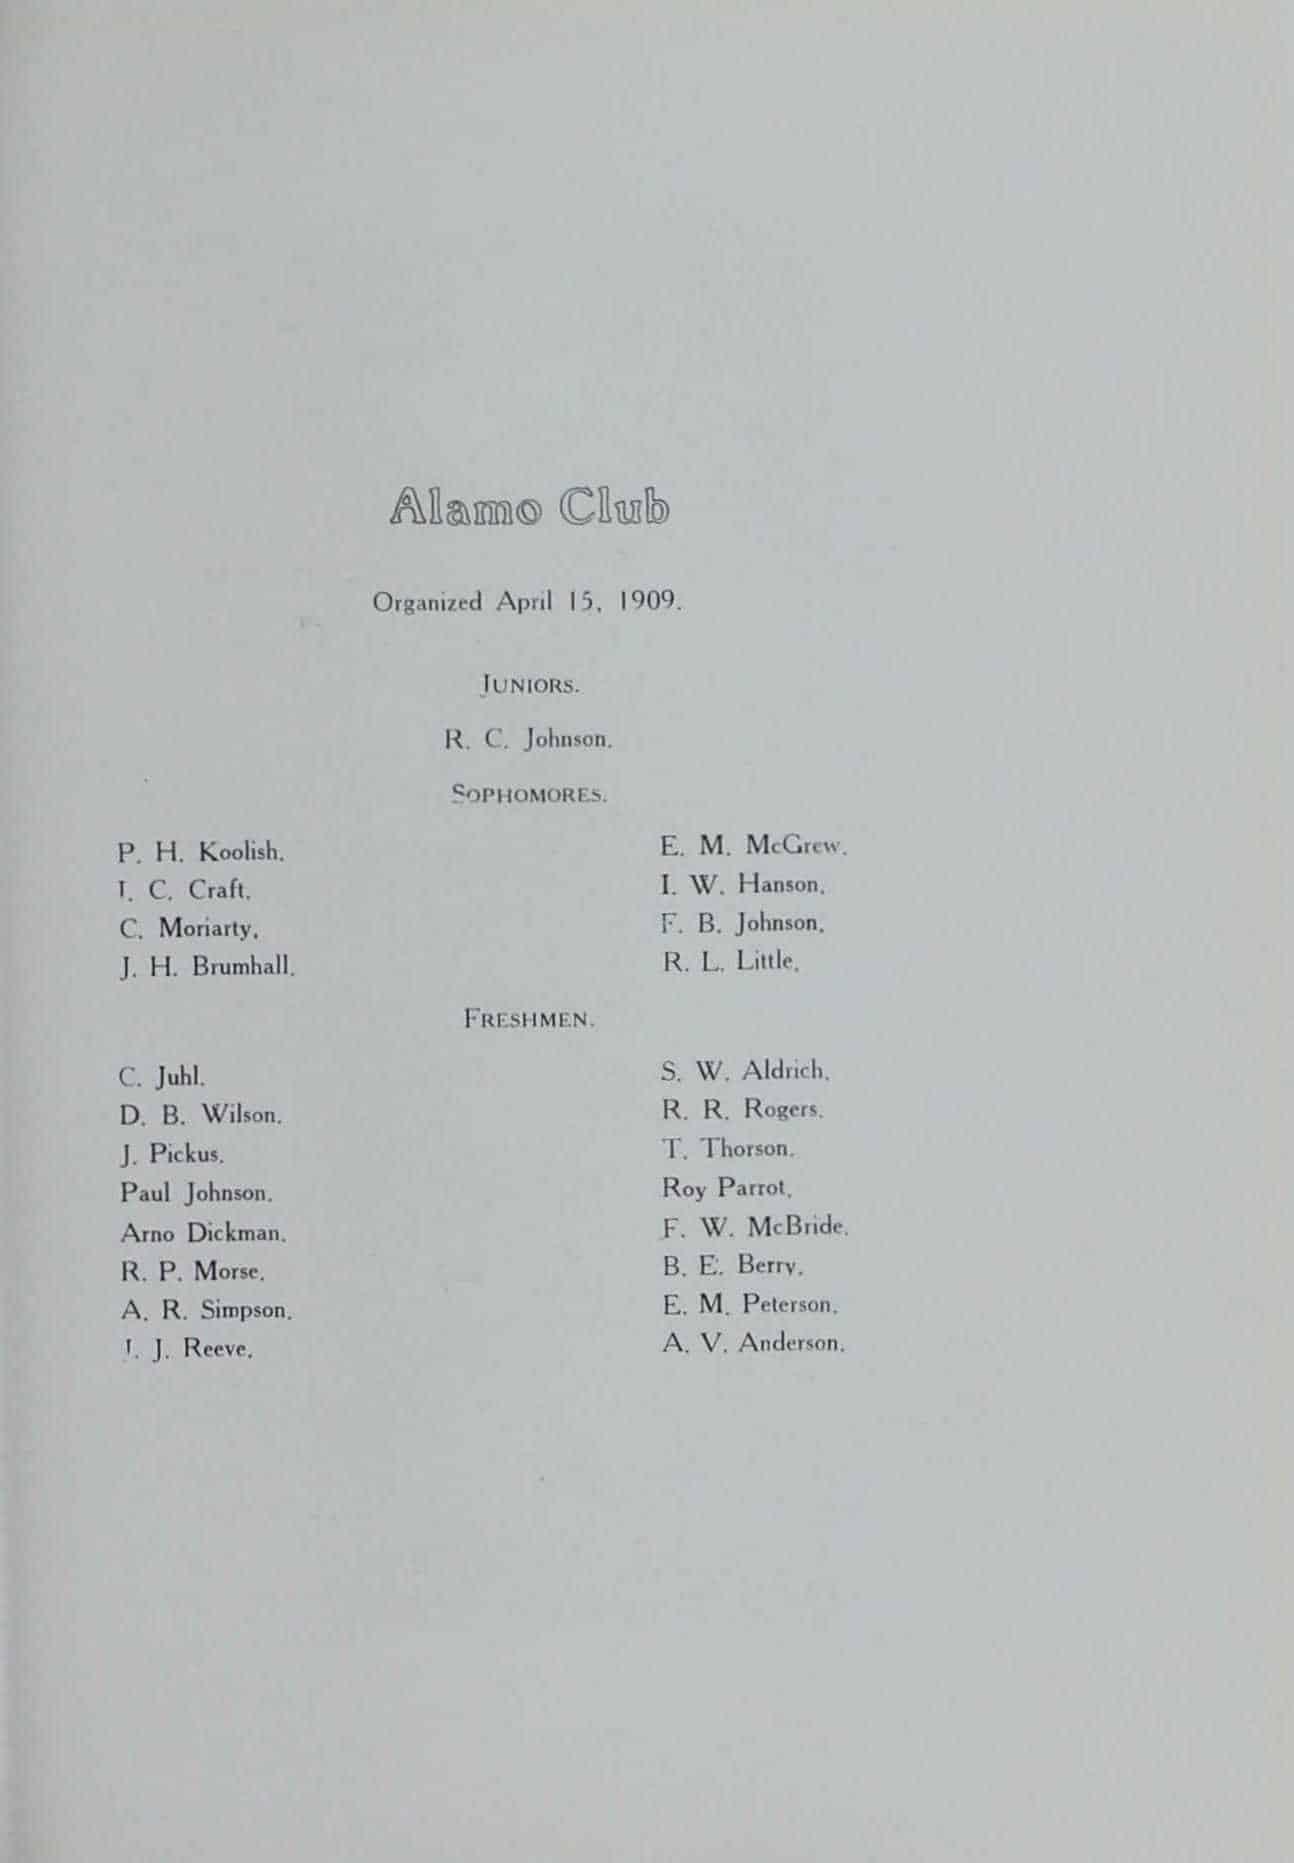 1910 Alamo Club Roster